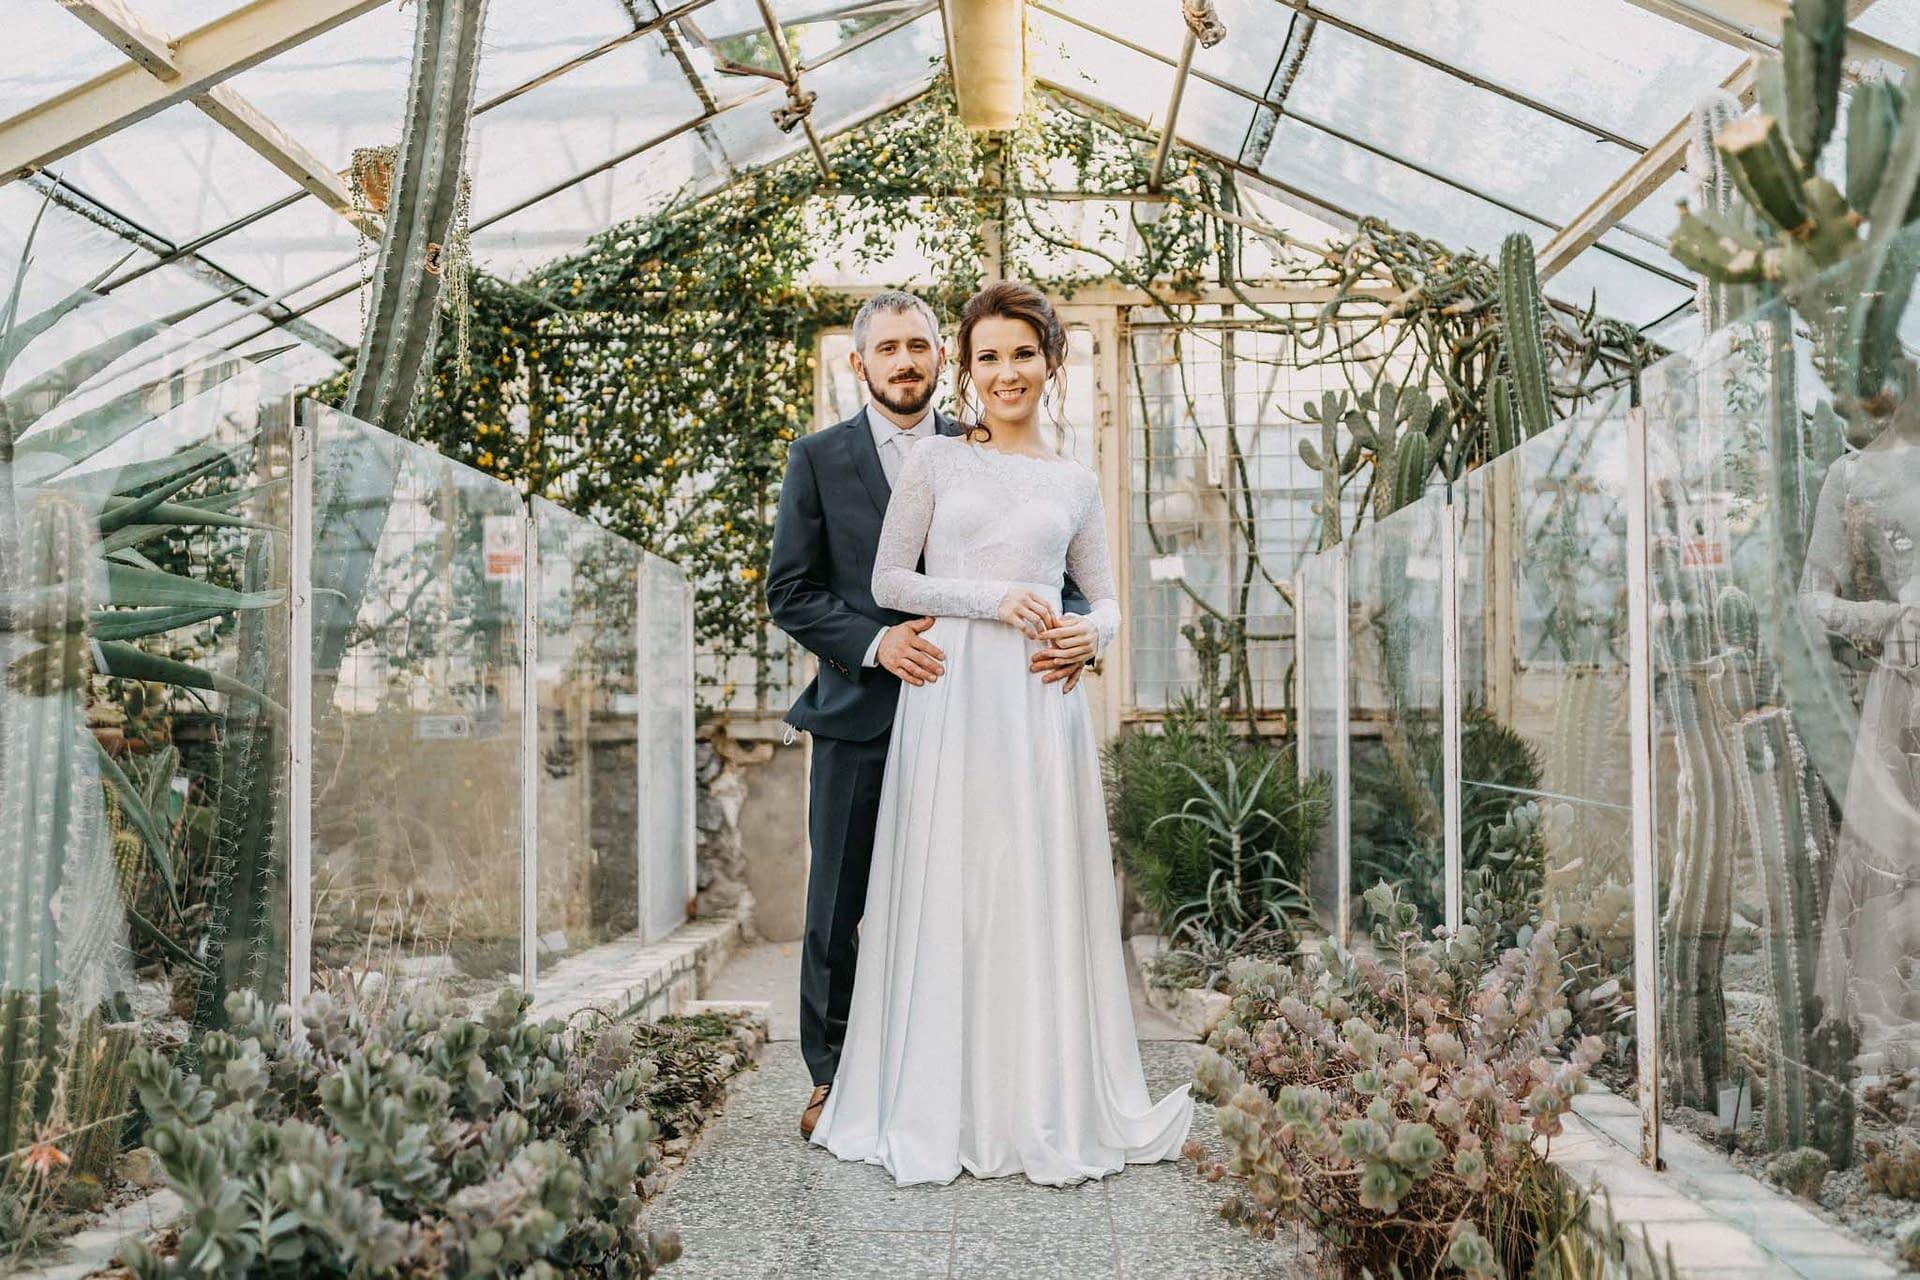 svadobne fotky bratislava botanicka zahrada